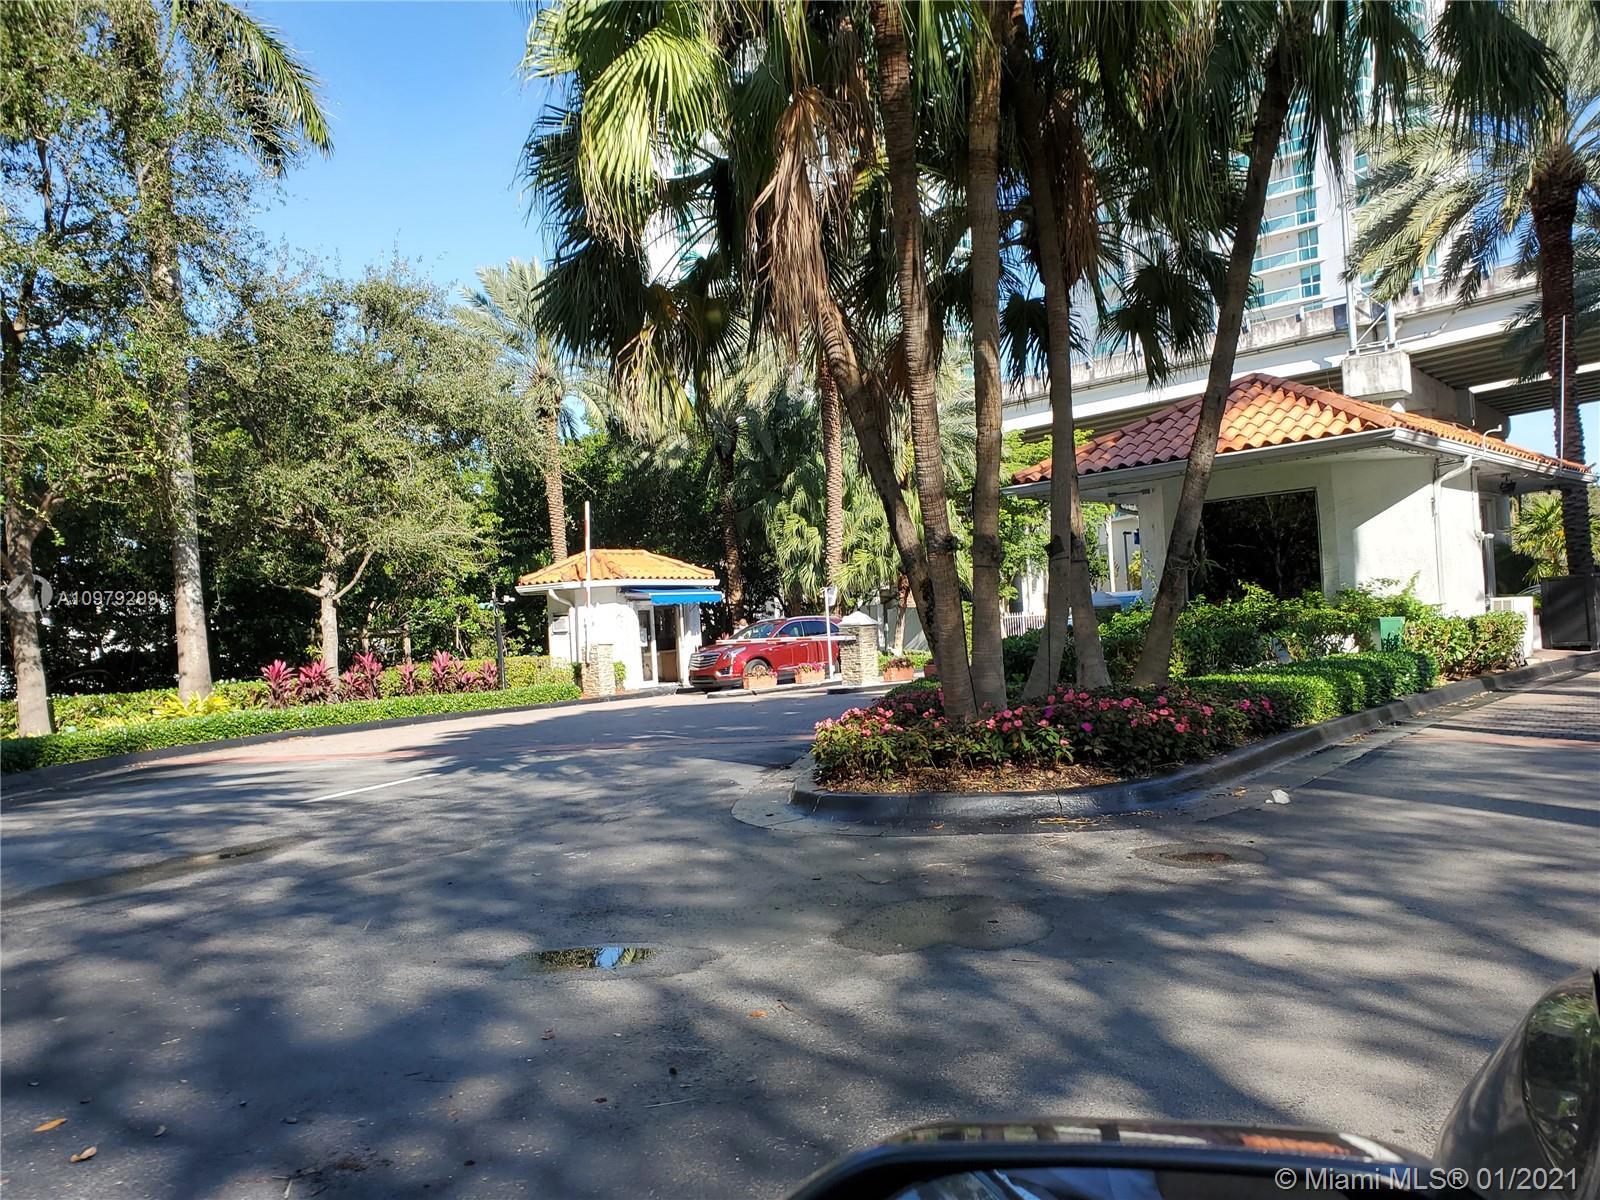 Photo of 3600 Mystic Pointe Dr #304, Aventura, Florida, 33180 - lake